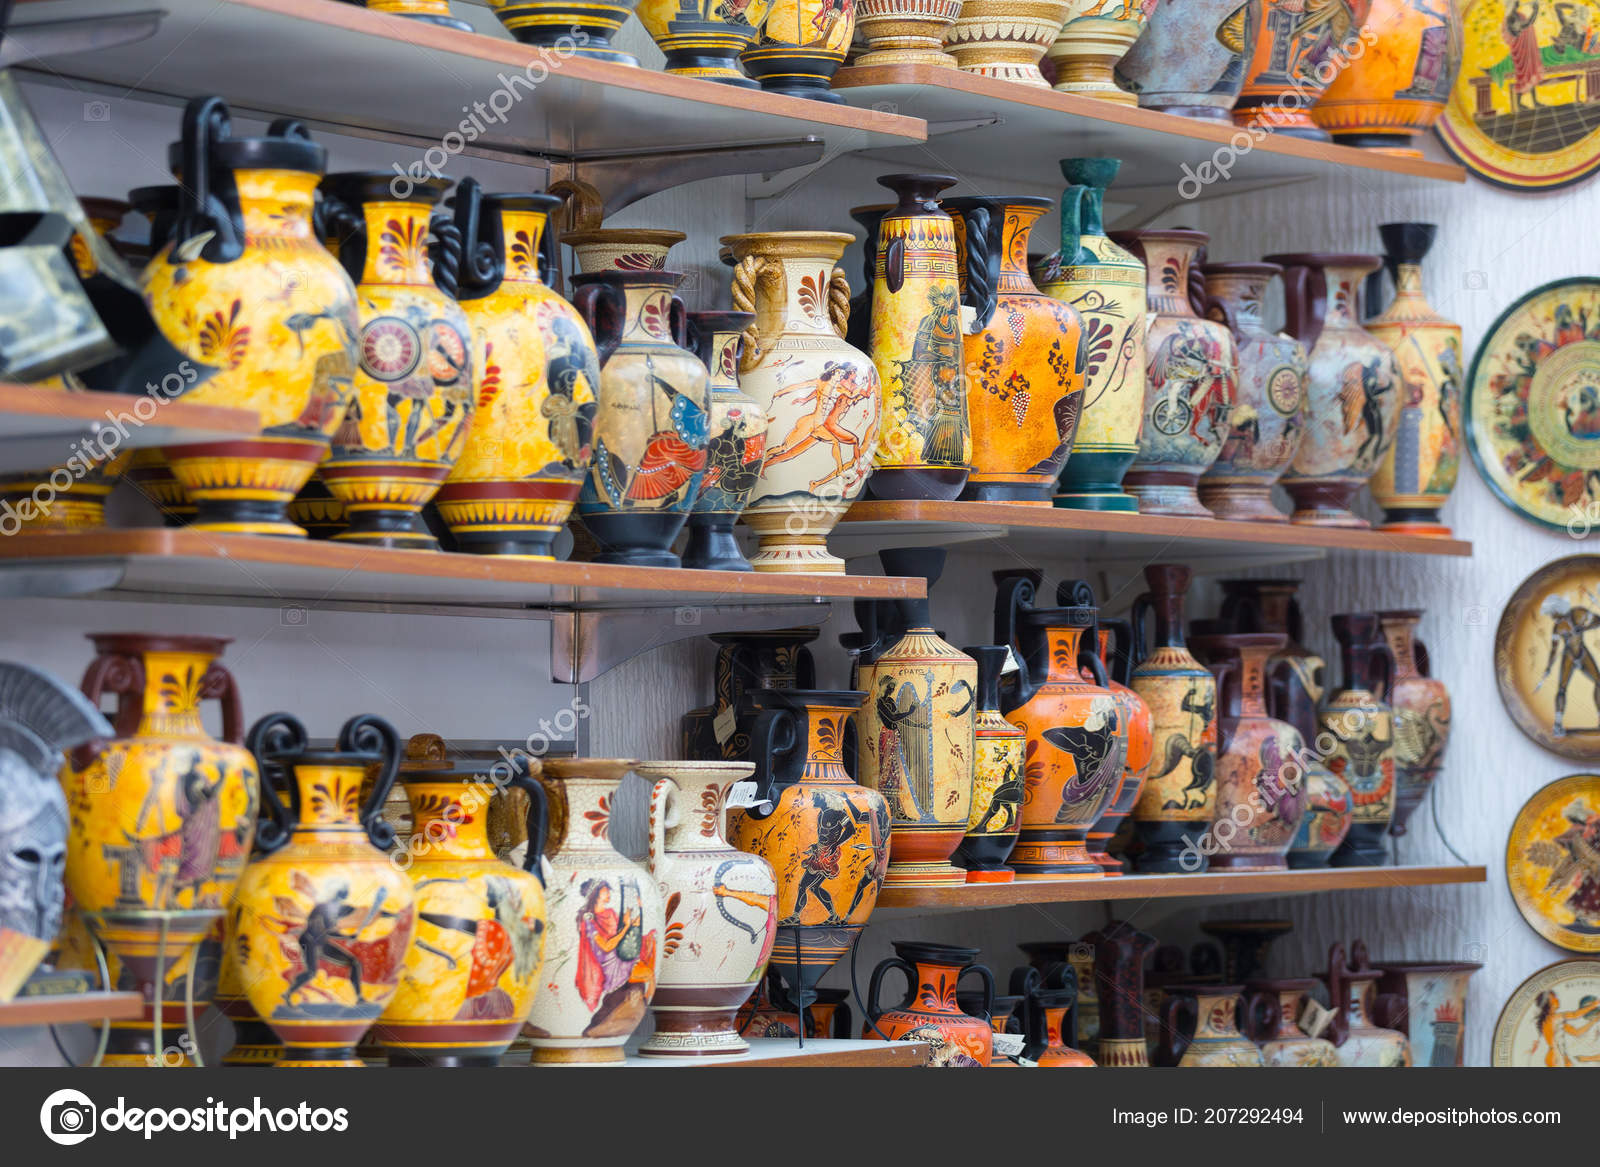 Suveniri - Page 5 Depositphotos_207292494-stock-photo-greece-athens-february-2017-souvenirs